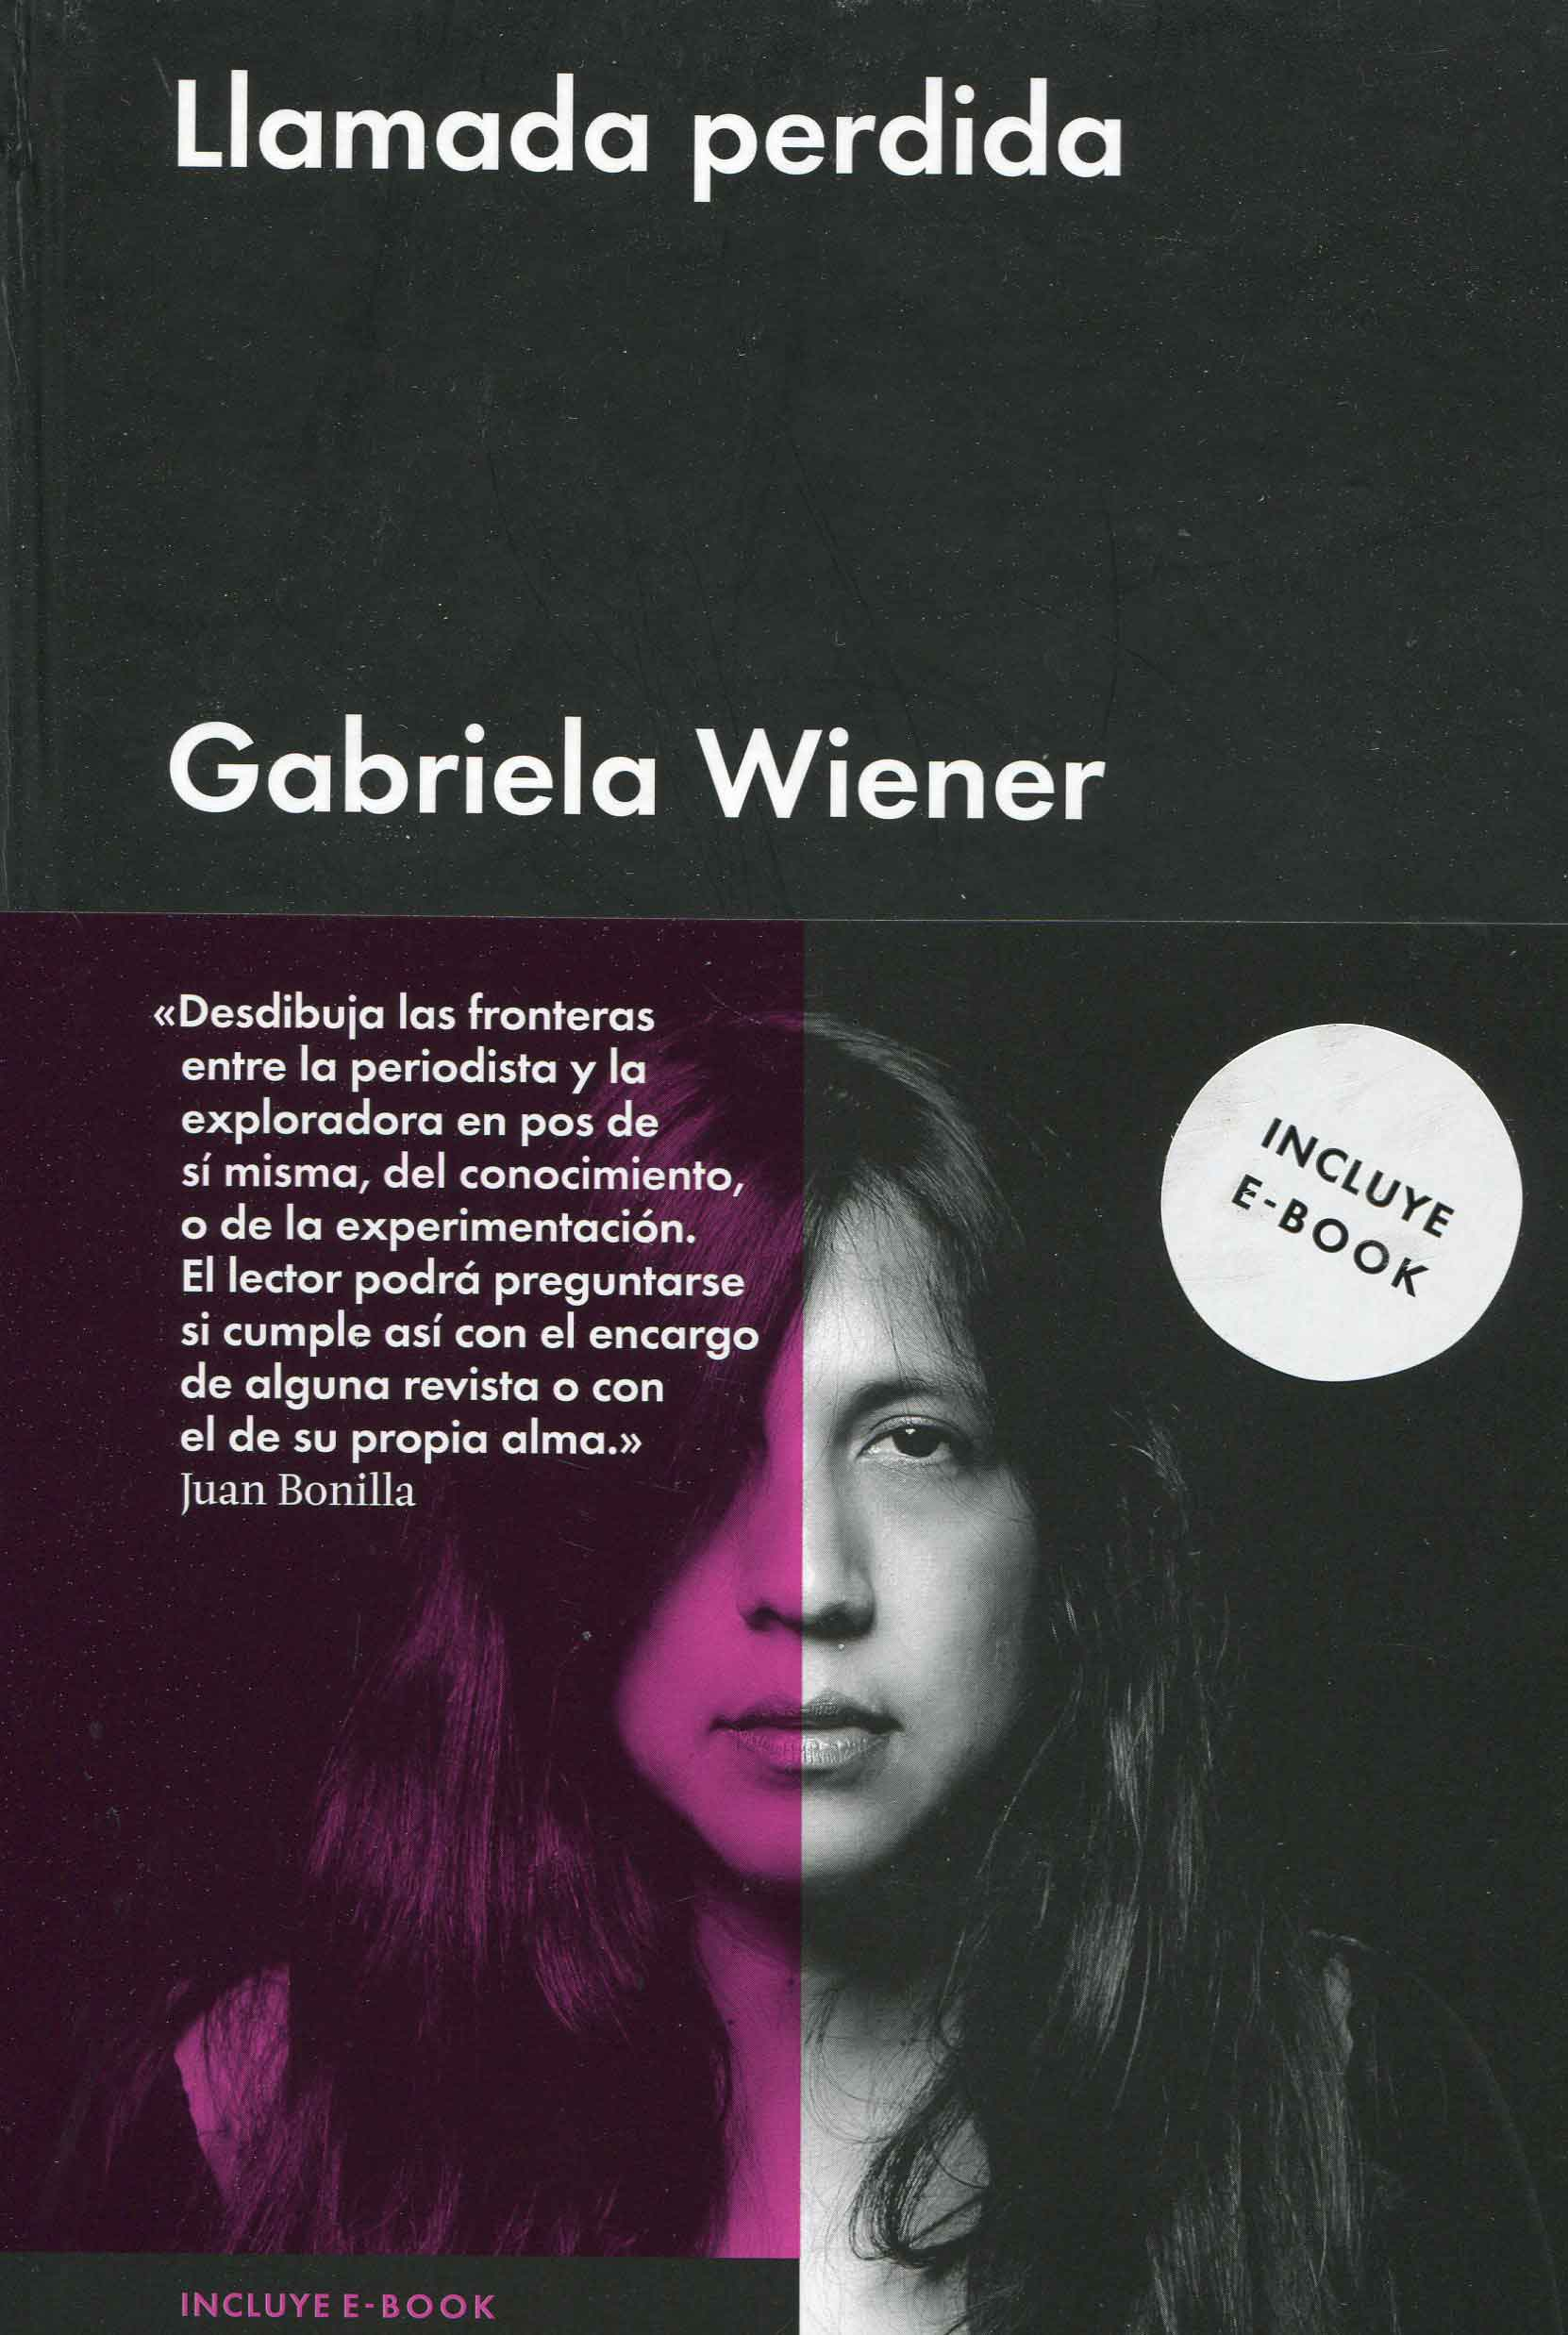 Gabriela Wiener, Llamada perdida; Barcelona, Malpaso, 2015.